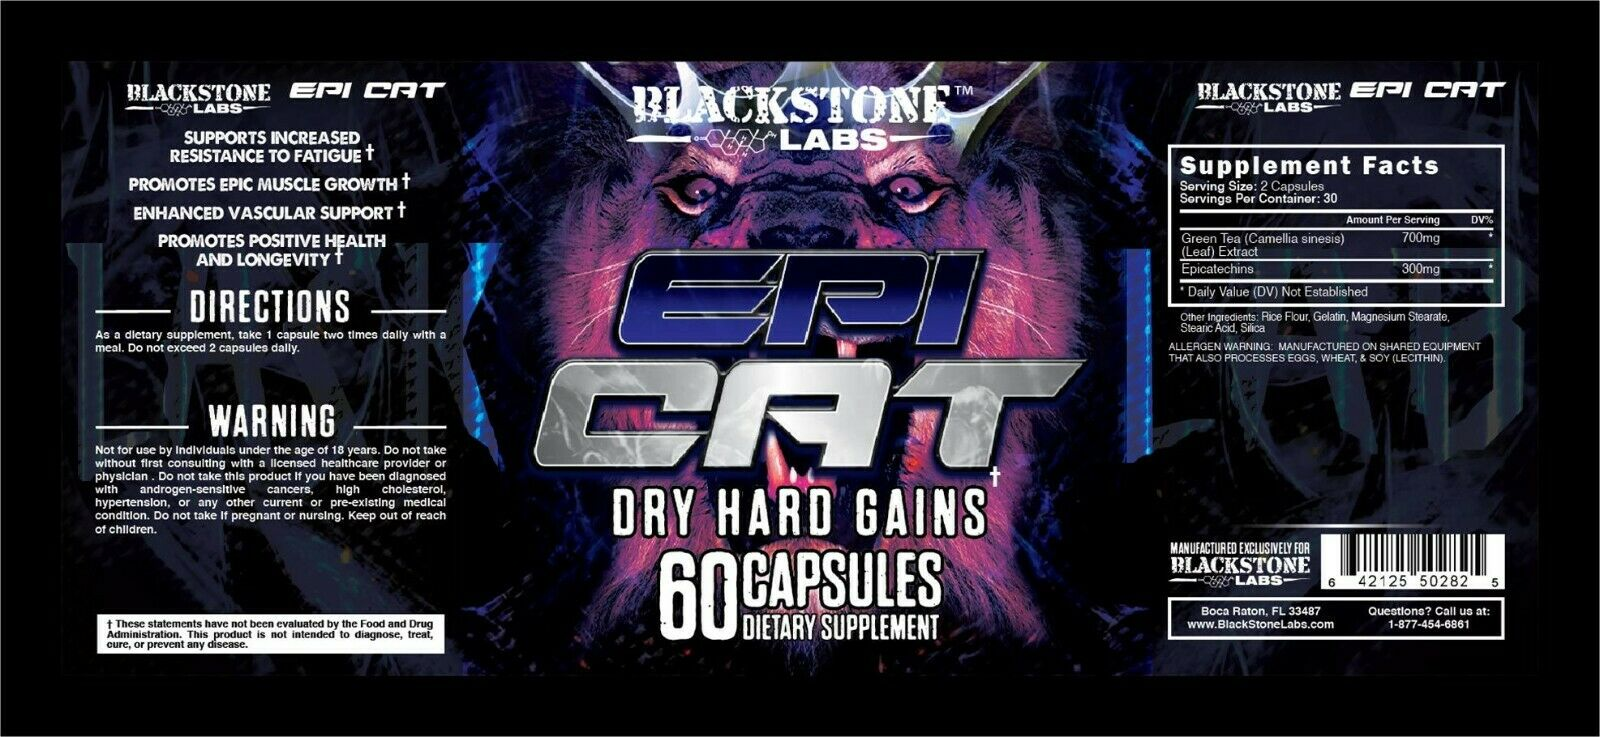 BLACKSTONE LABS EPICAT Bodybuilding, Powerlifting, Muscle Growth Epi Cat 1